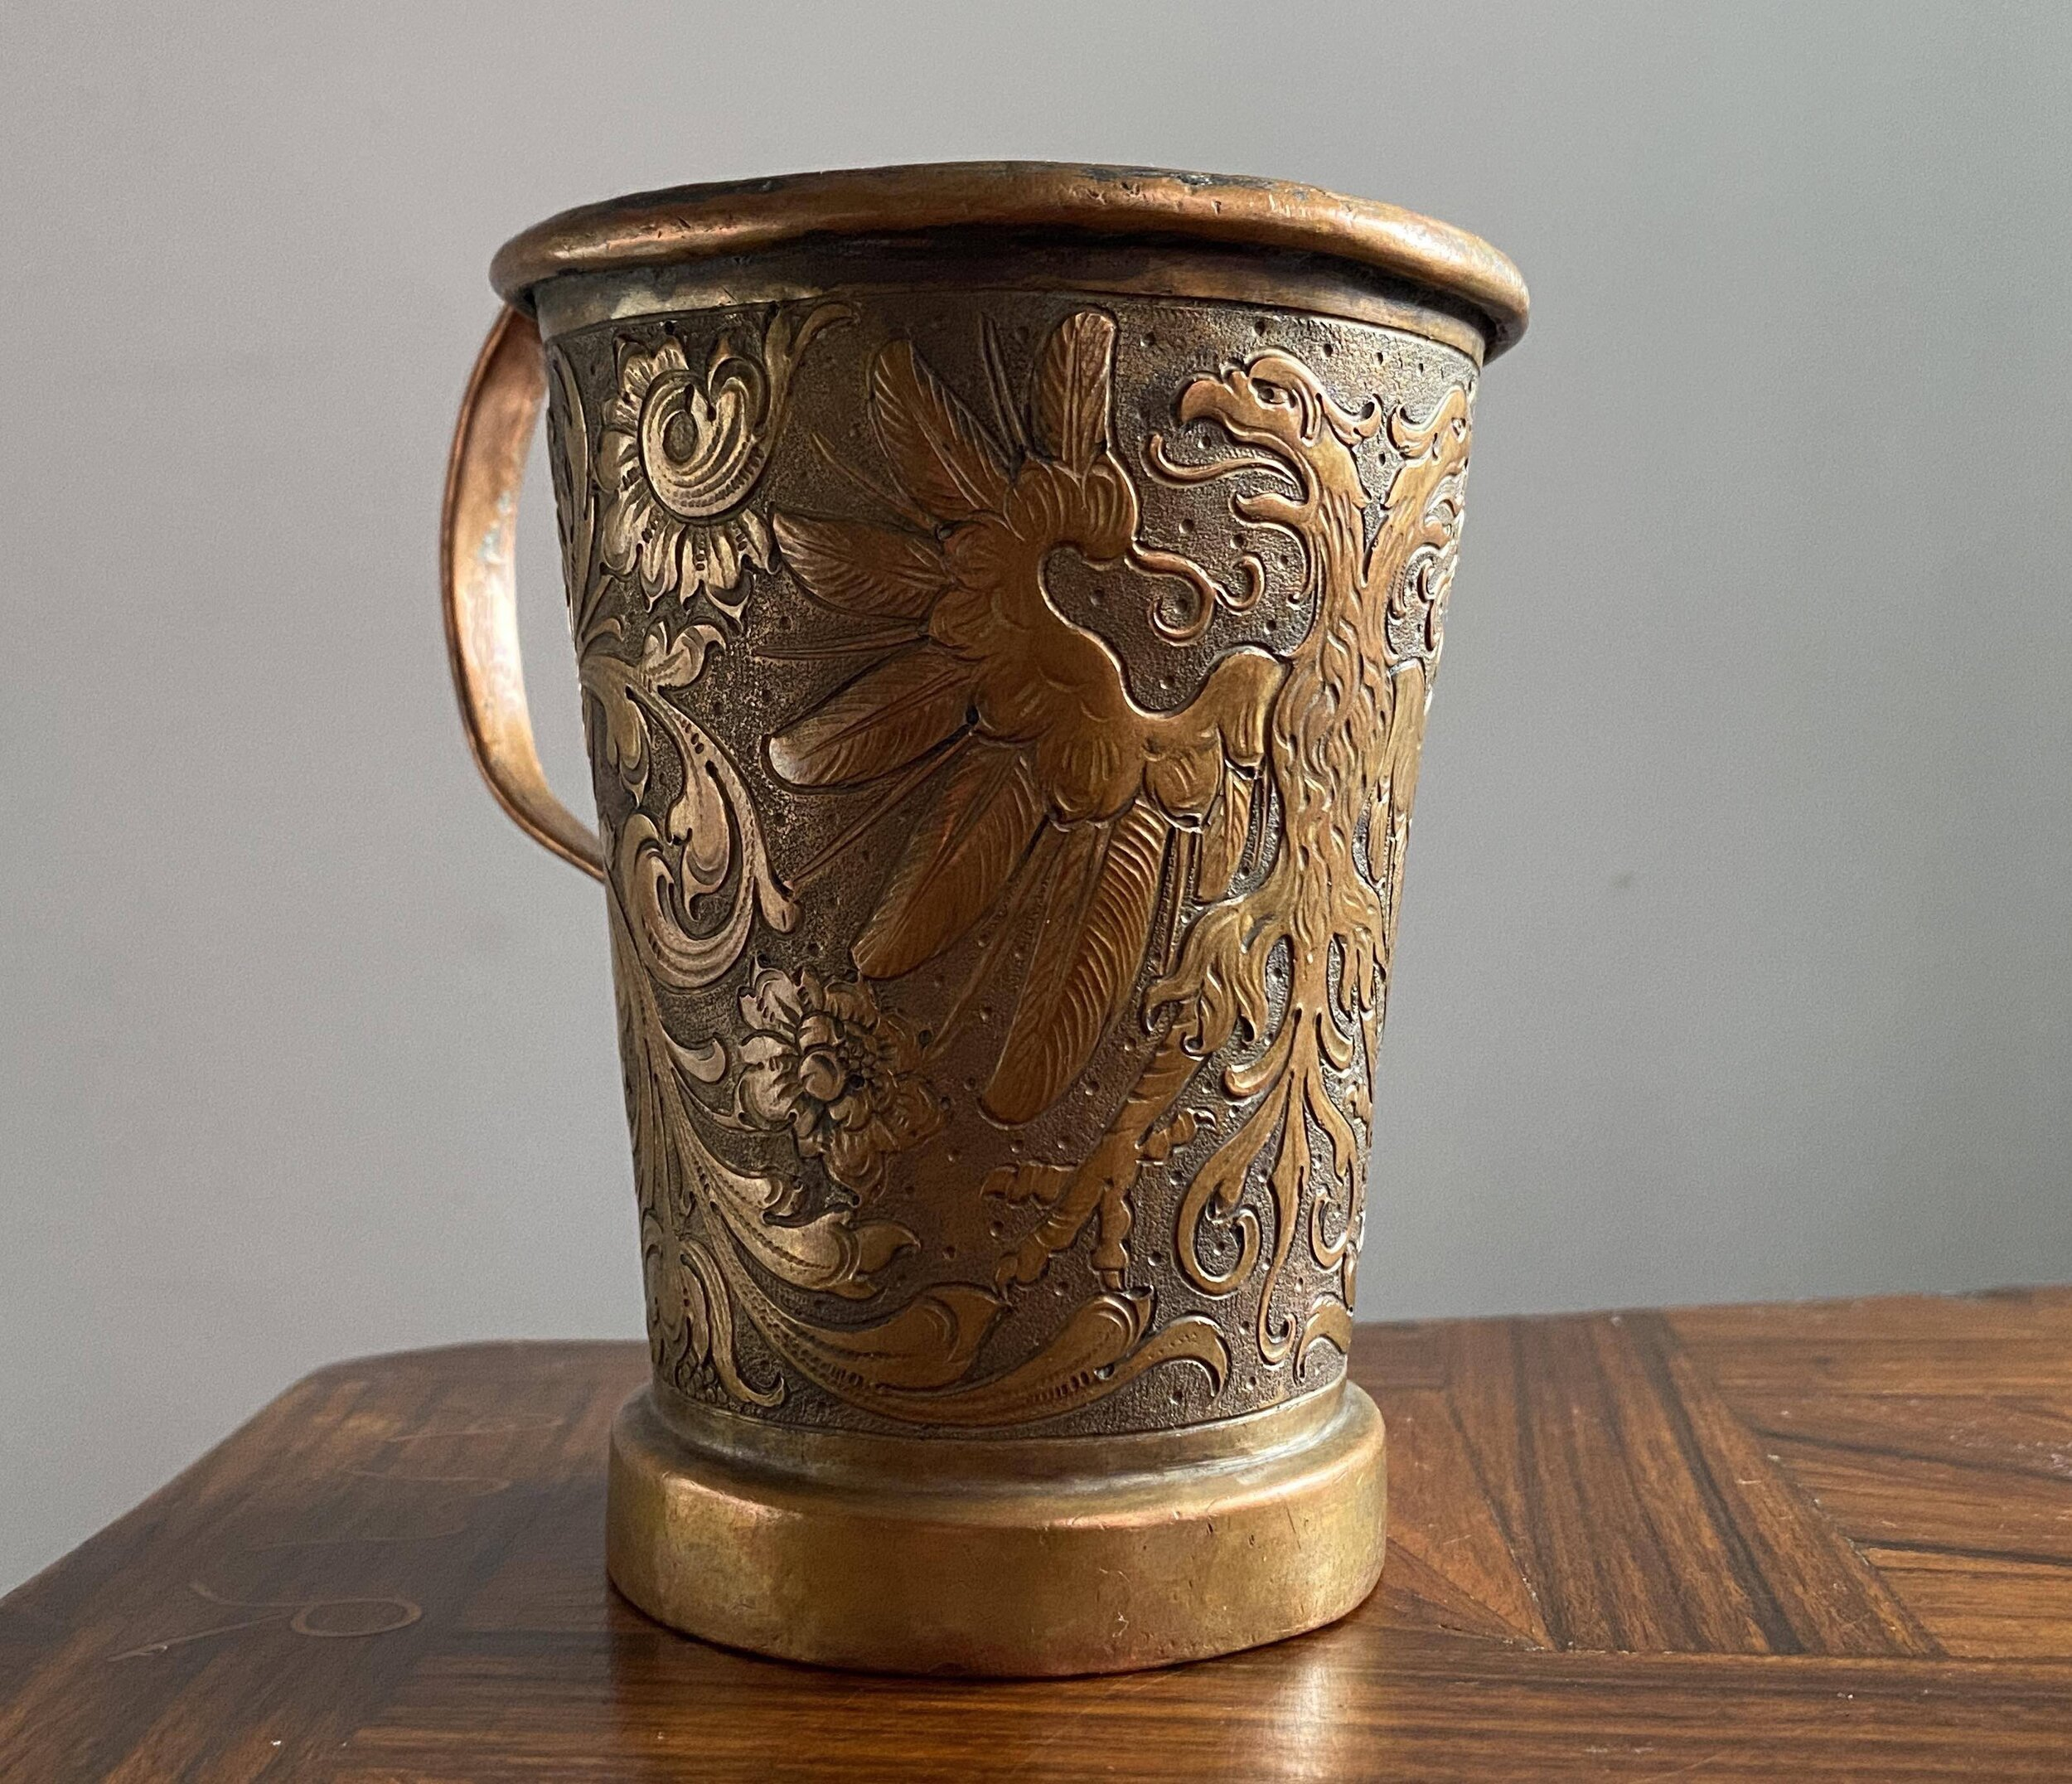 Bohemia Copper Beer Mug first view